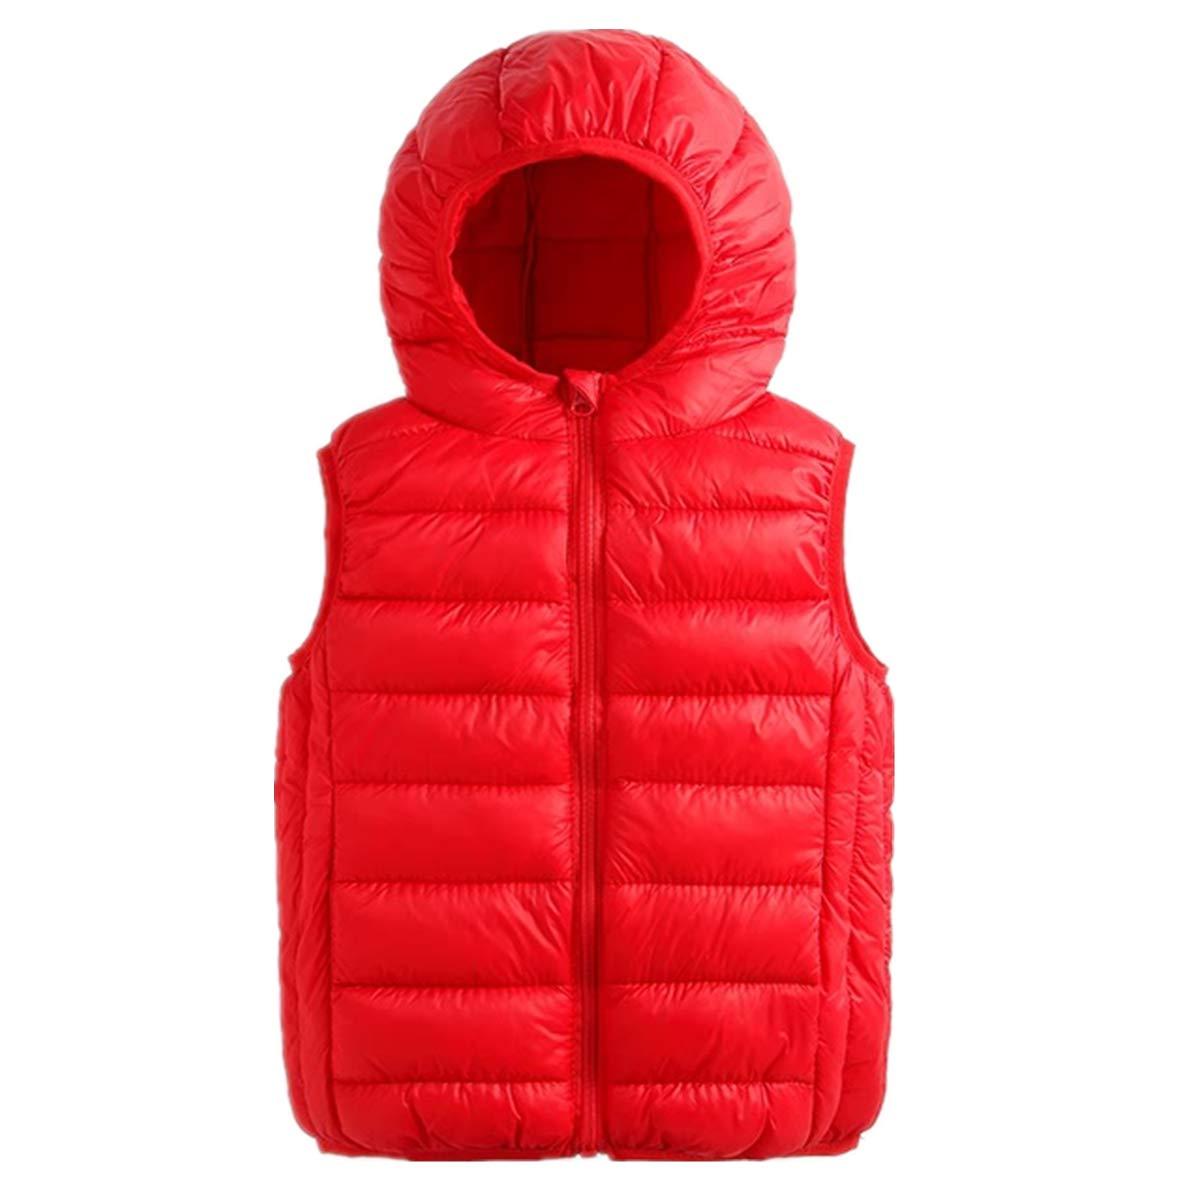 Beiduoxiong Boys Girls Lightweight Packable Hood Warm Puffer Down Cotton Vest 2-7 Y